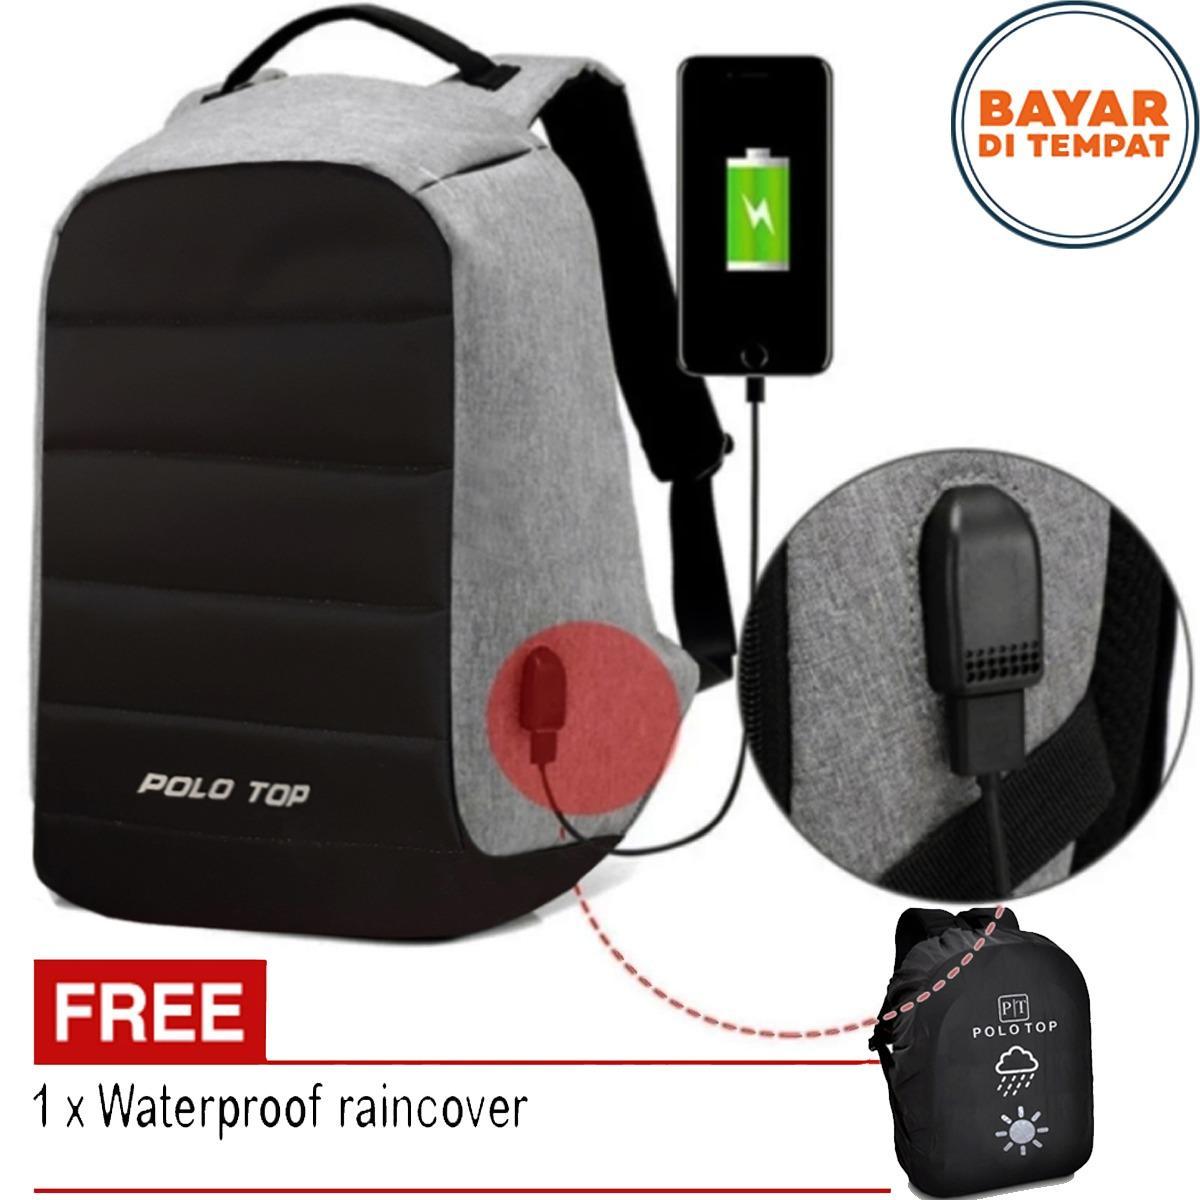 Polo Top Tas Ransel USB Tas Charger Tas Laptop Tas Punggung Tas Kerja 8802 Tas Anti Maling Tas Polo Import Original - Black Grey + Raincover